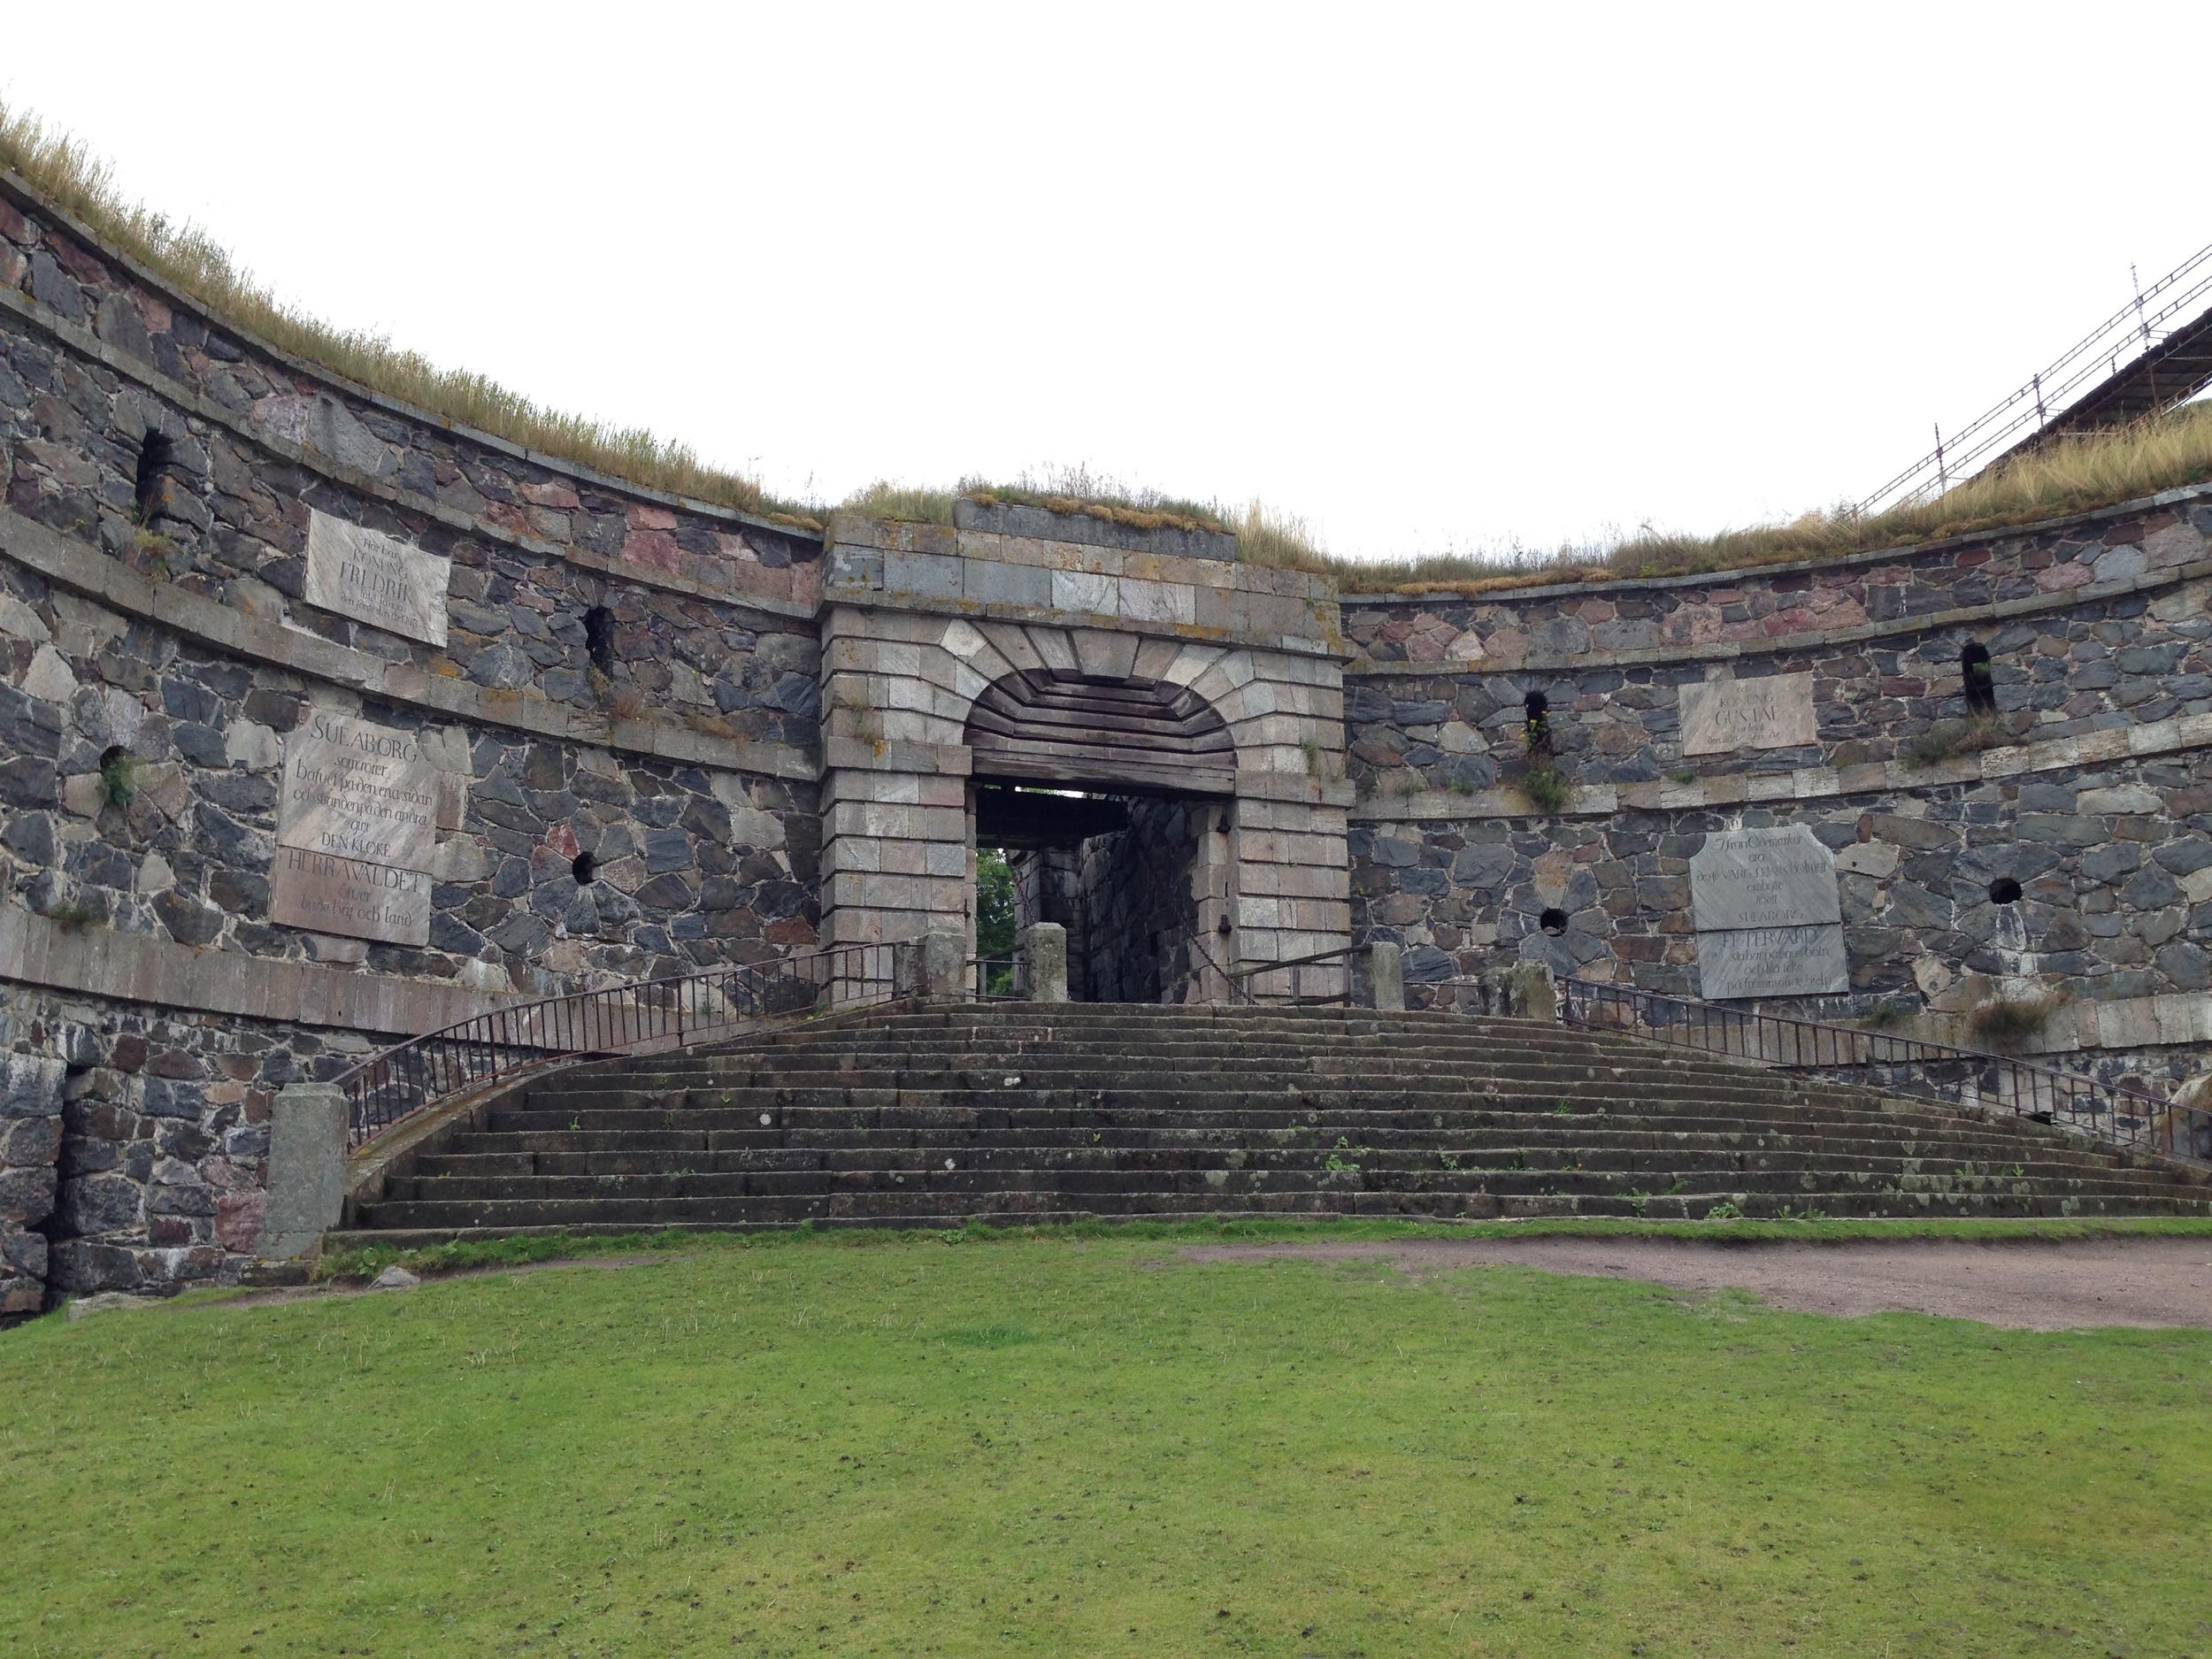 King's Gate at Suomenlinna - the sea fortress' proper entrance.